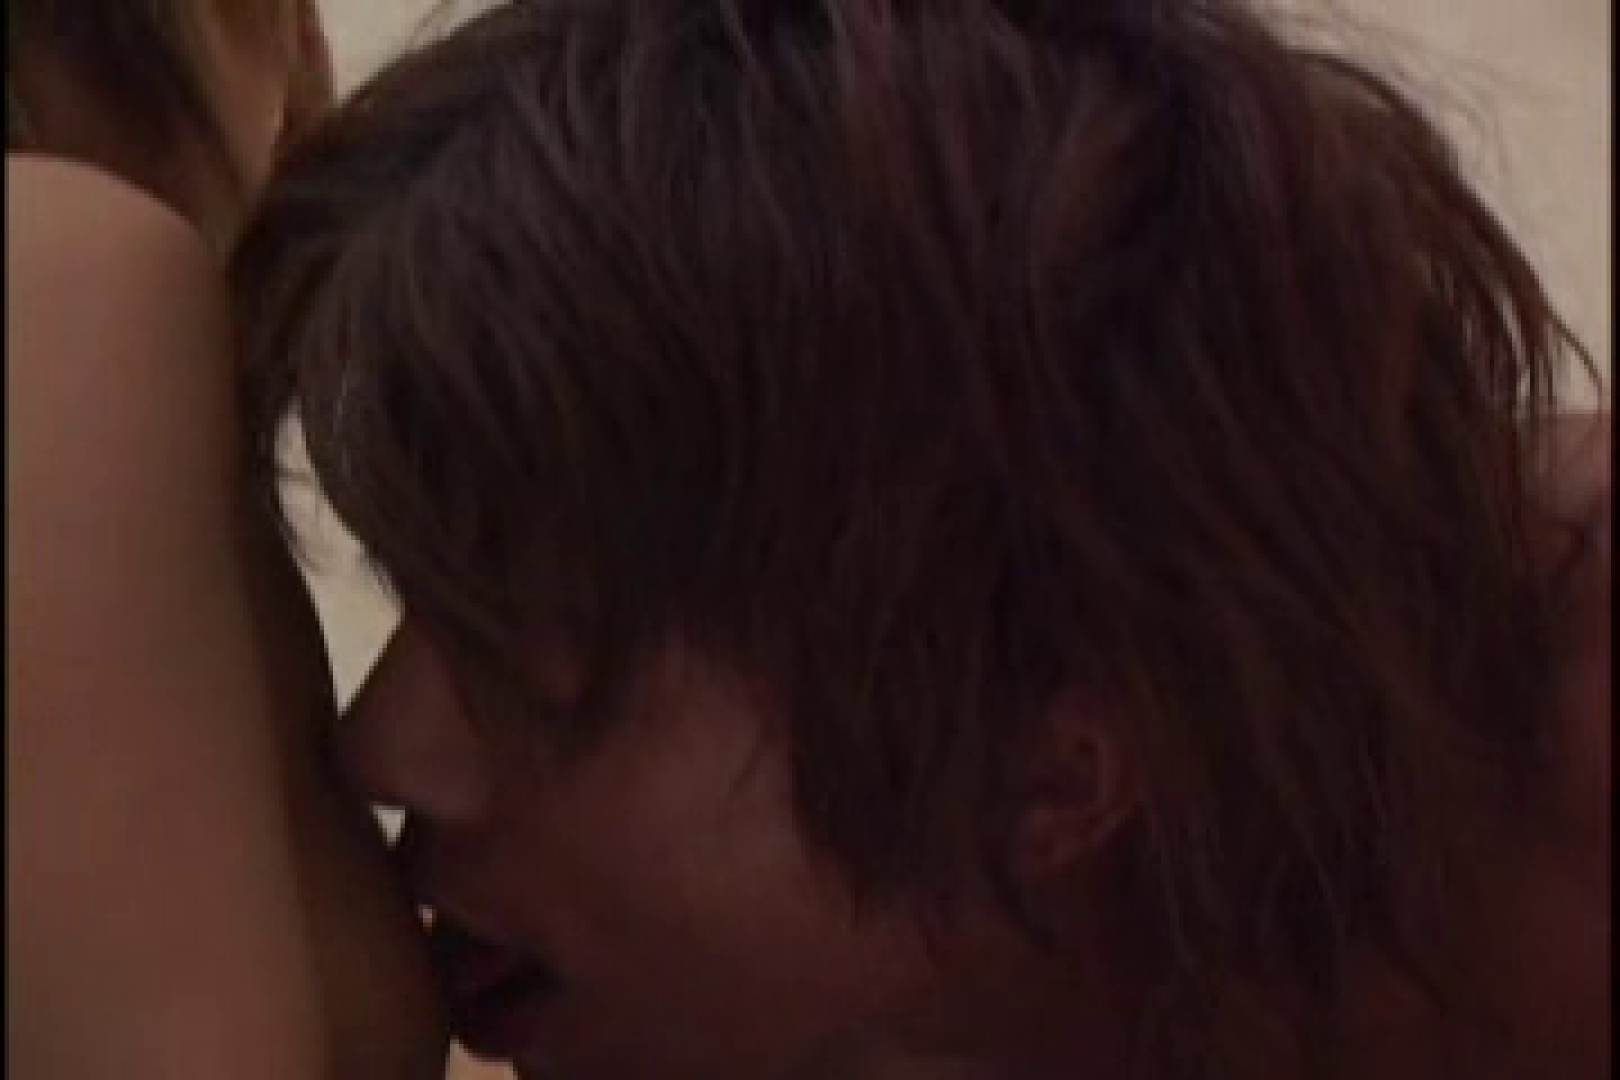 BEST OF イケメン!!男目線のガチSEX vol.02(対女性作品) フェラシーン ゲイエロ動画 54画像 29